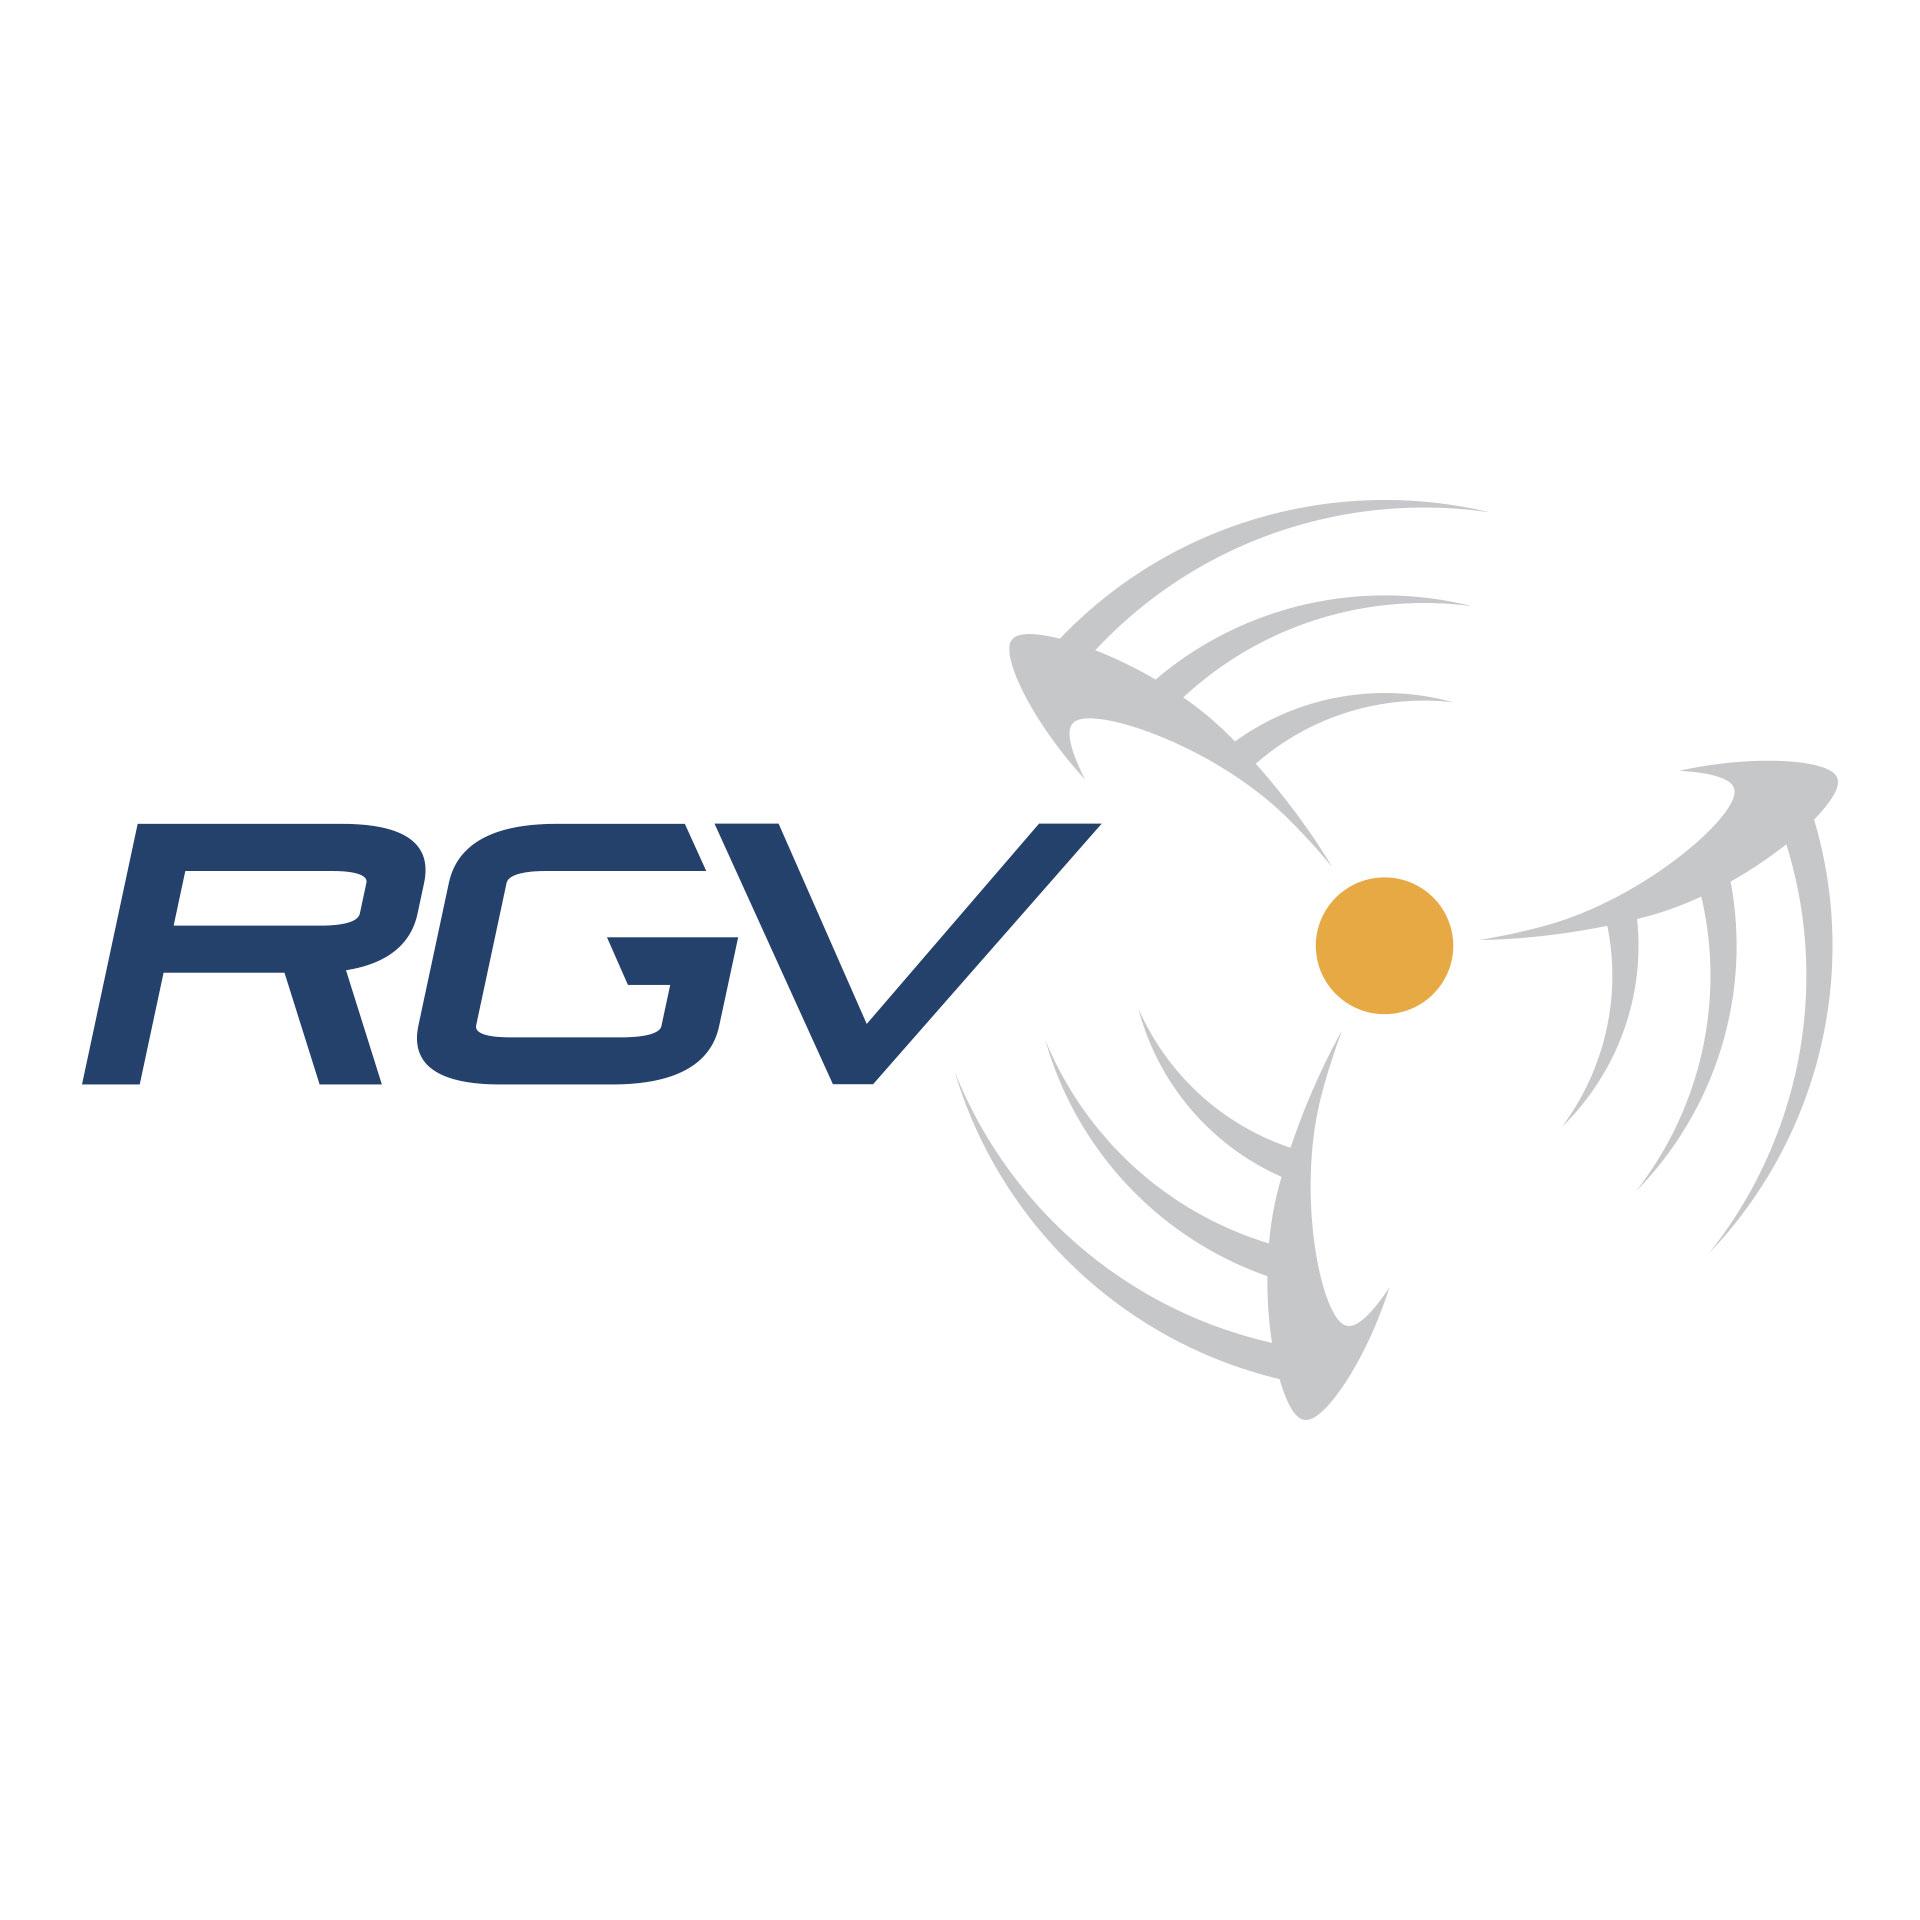 RGV Aviation logo